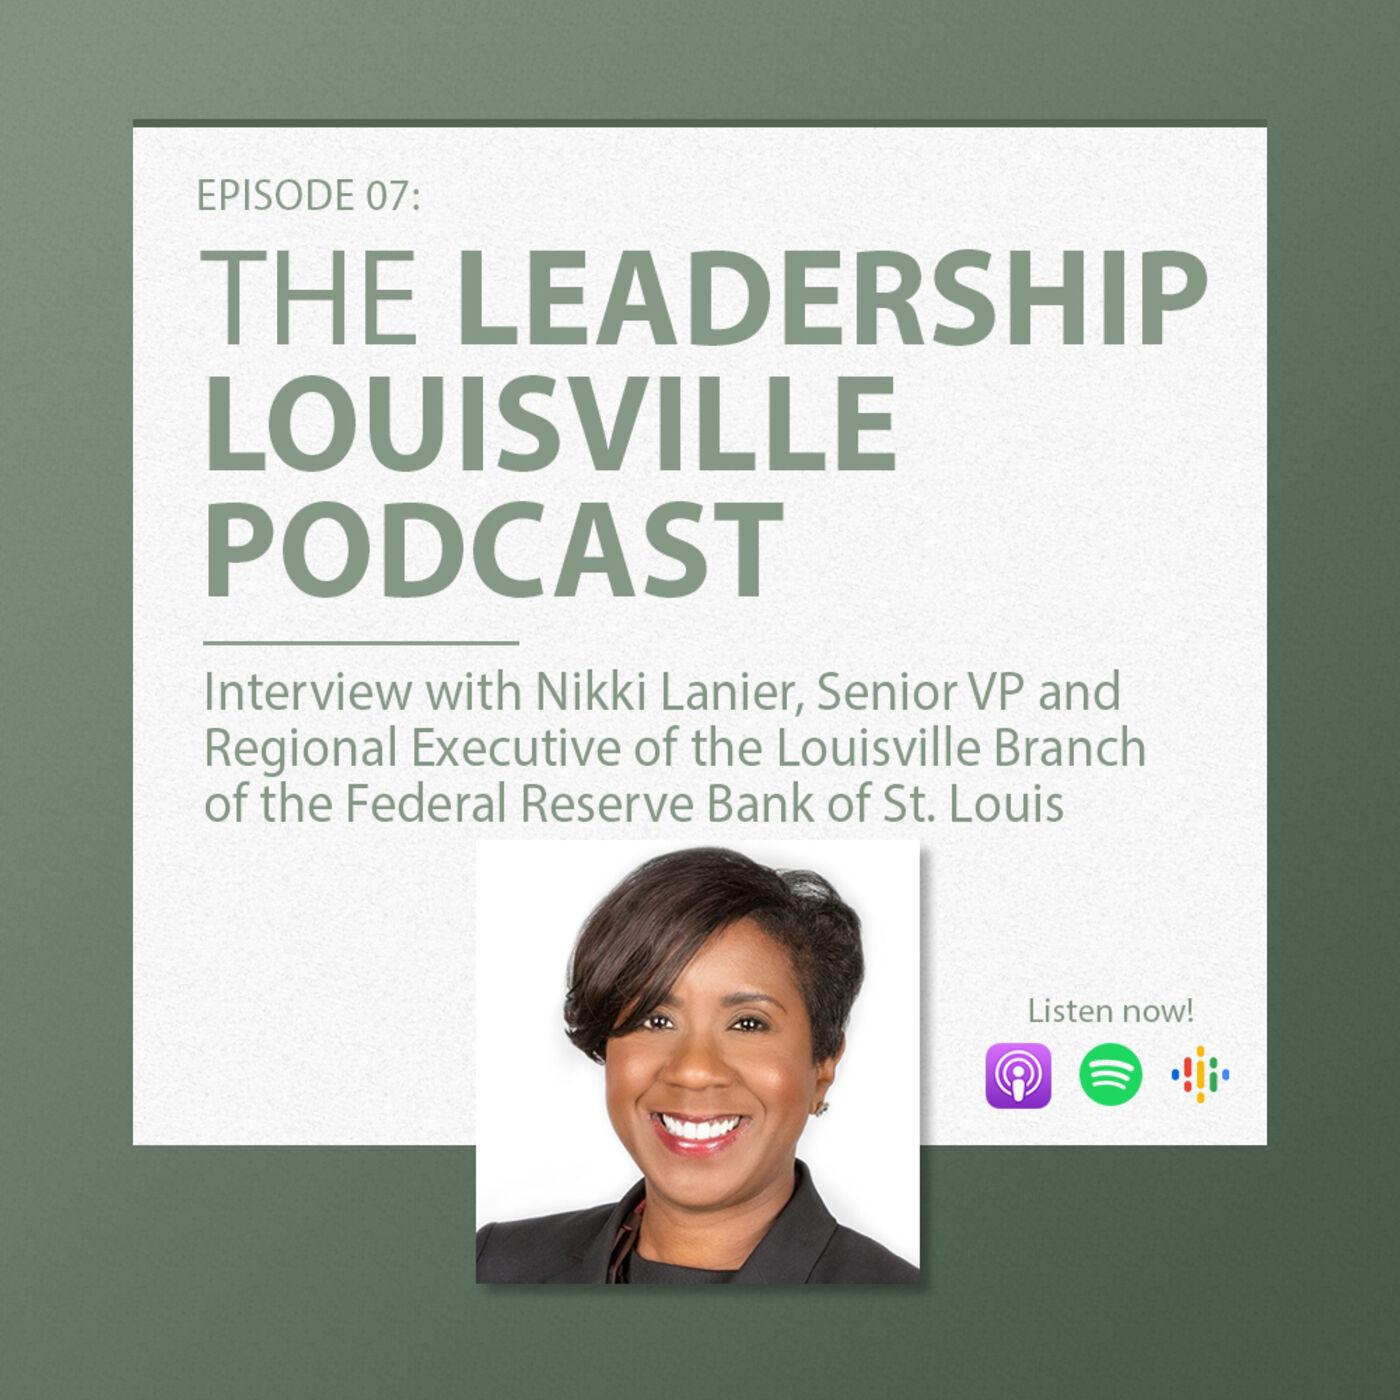 Nikki Lanier, Senior VP, Louisville Branch of the Federal Reserve Bank of St. Louis